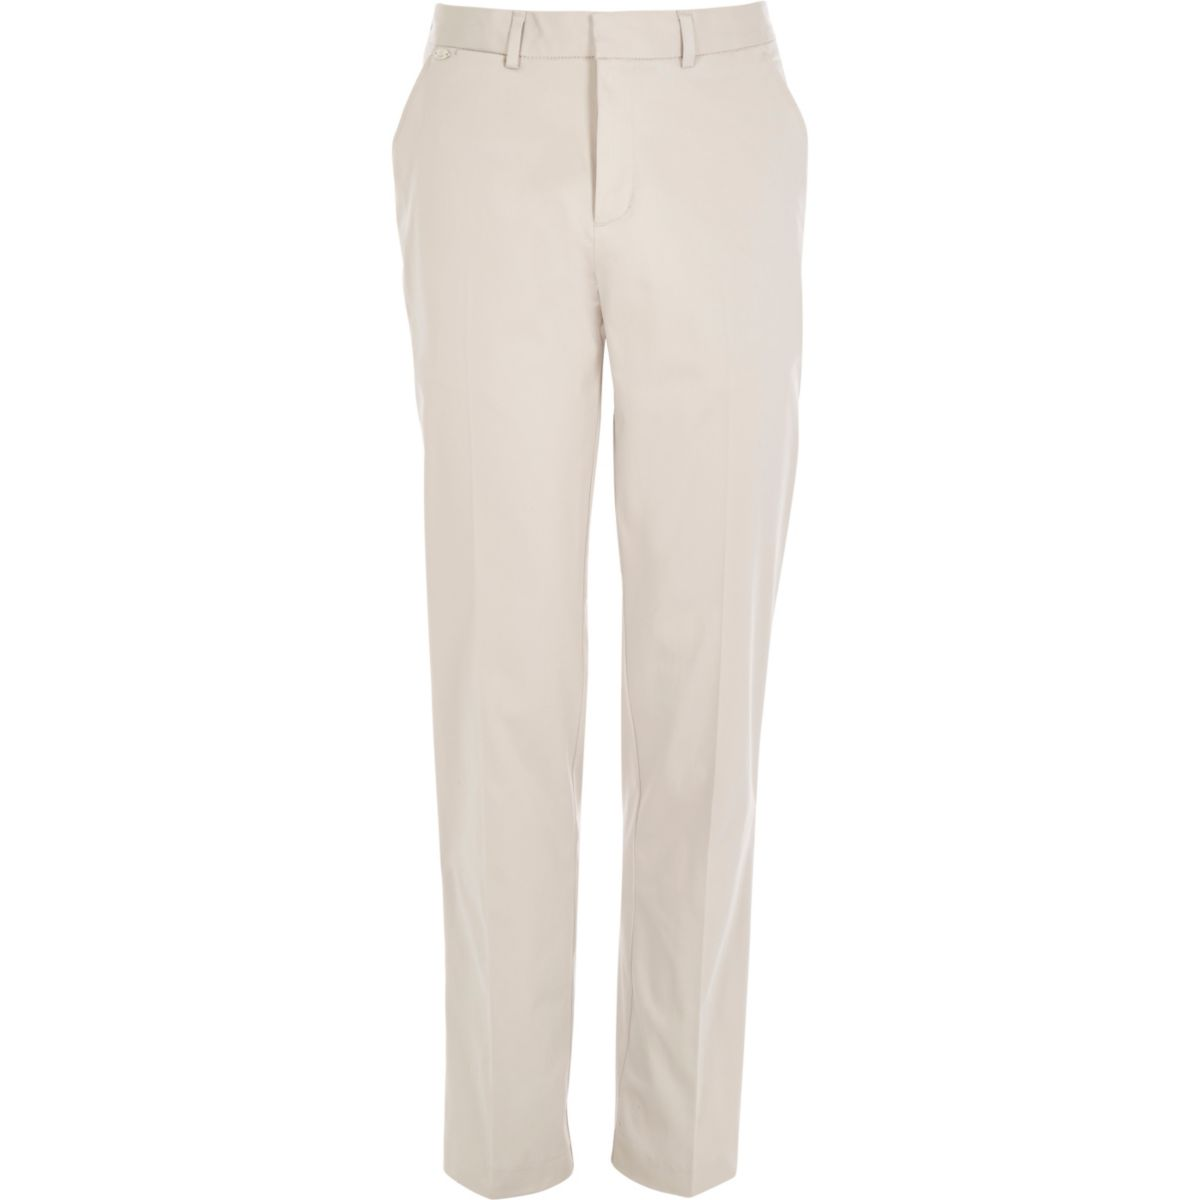 Ecru smart stretch slim fit pants